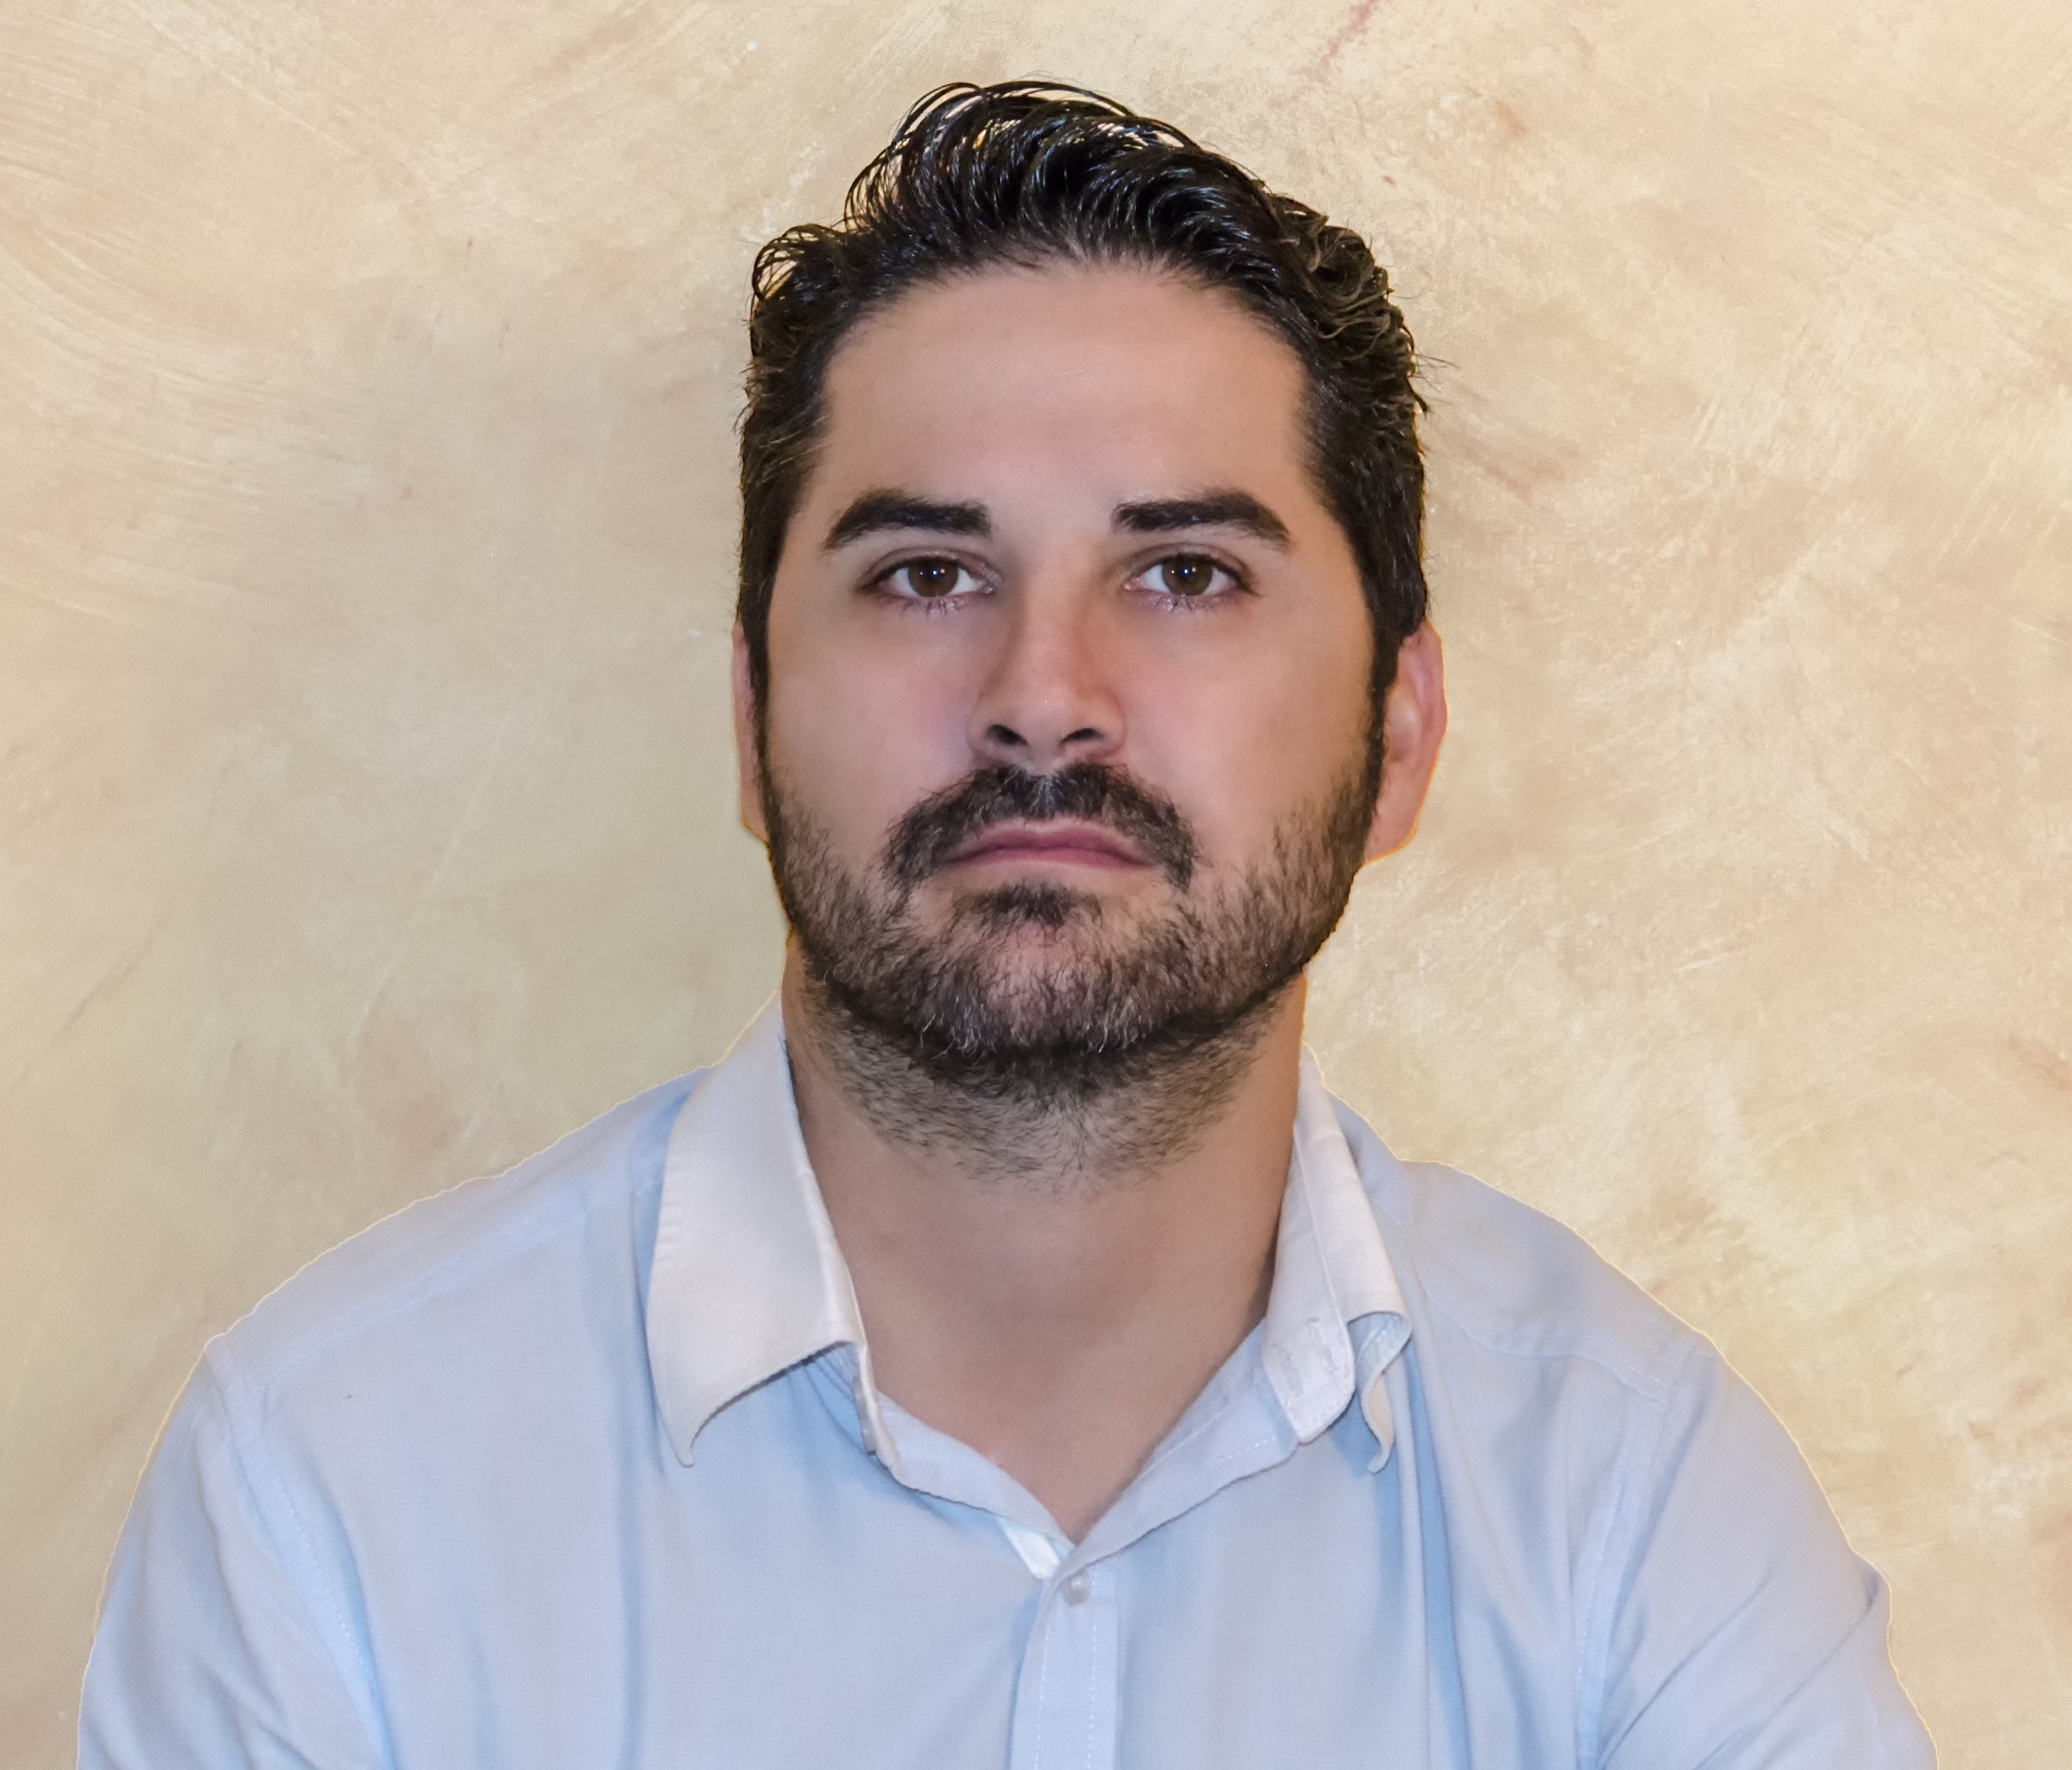 José Óscar Vila Chaves